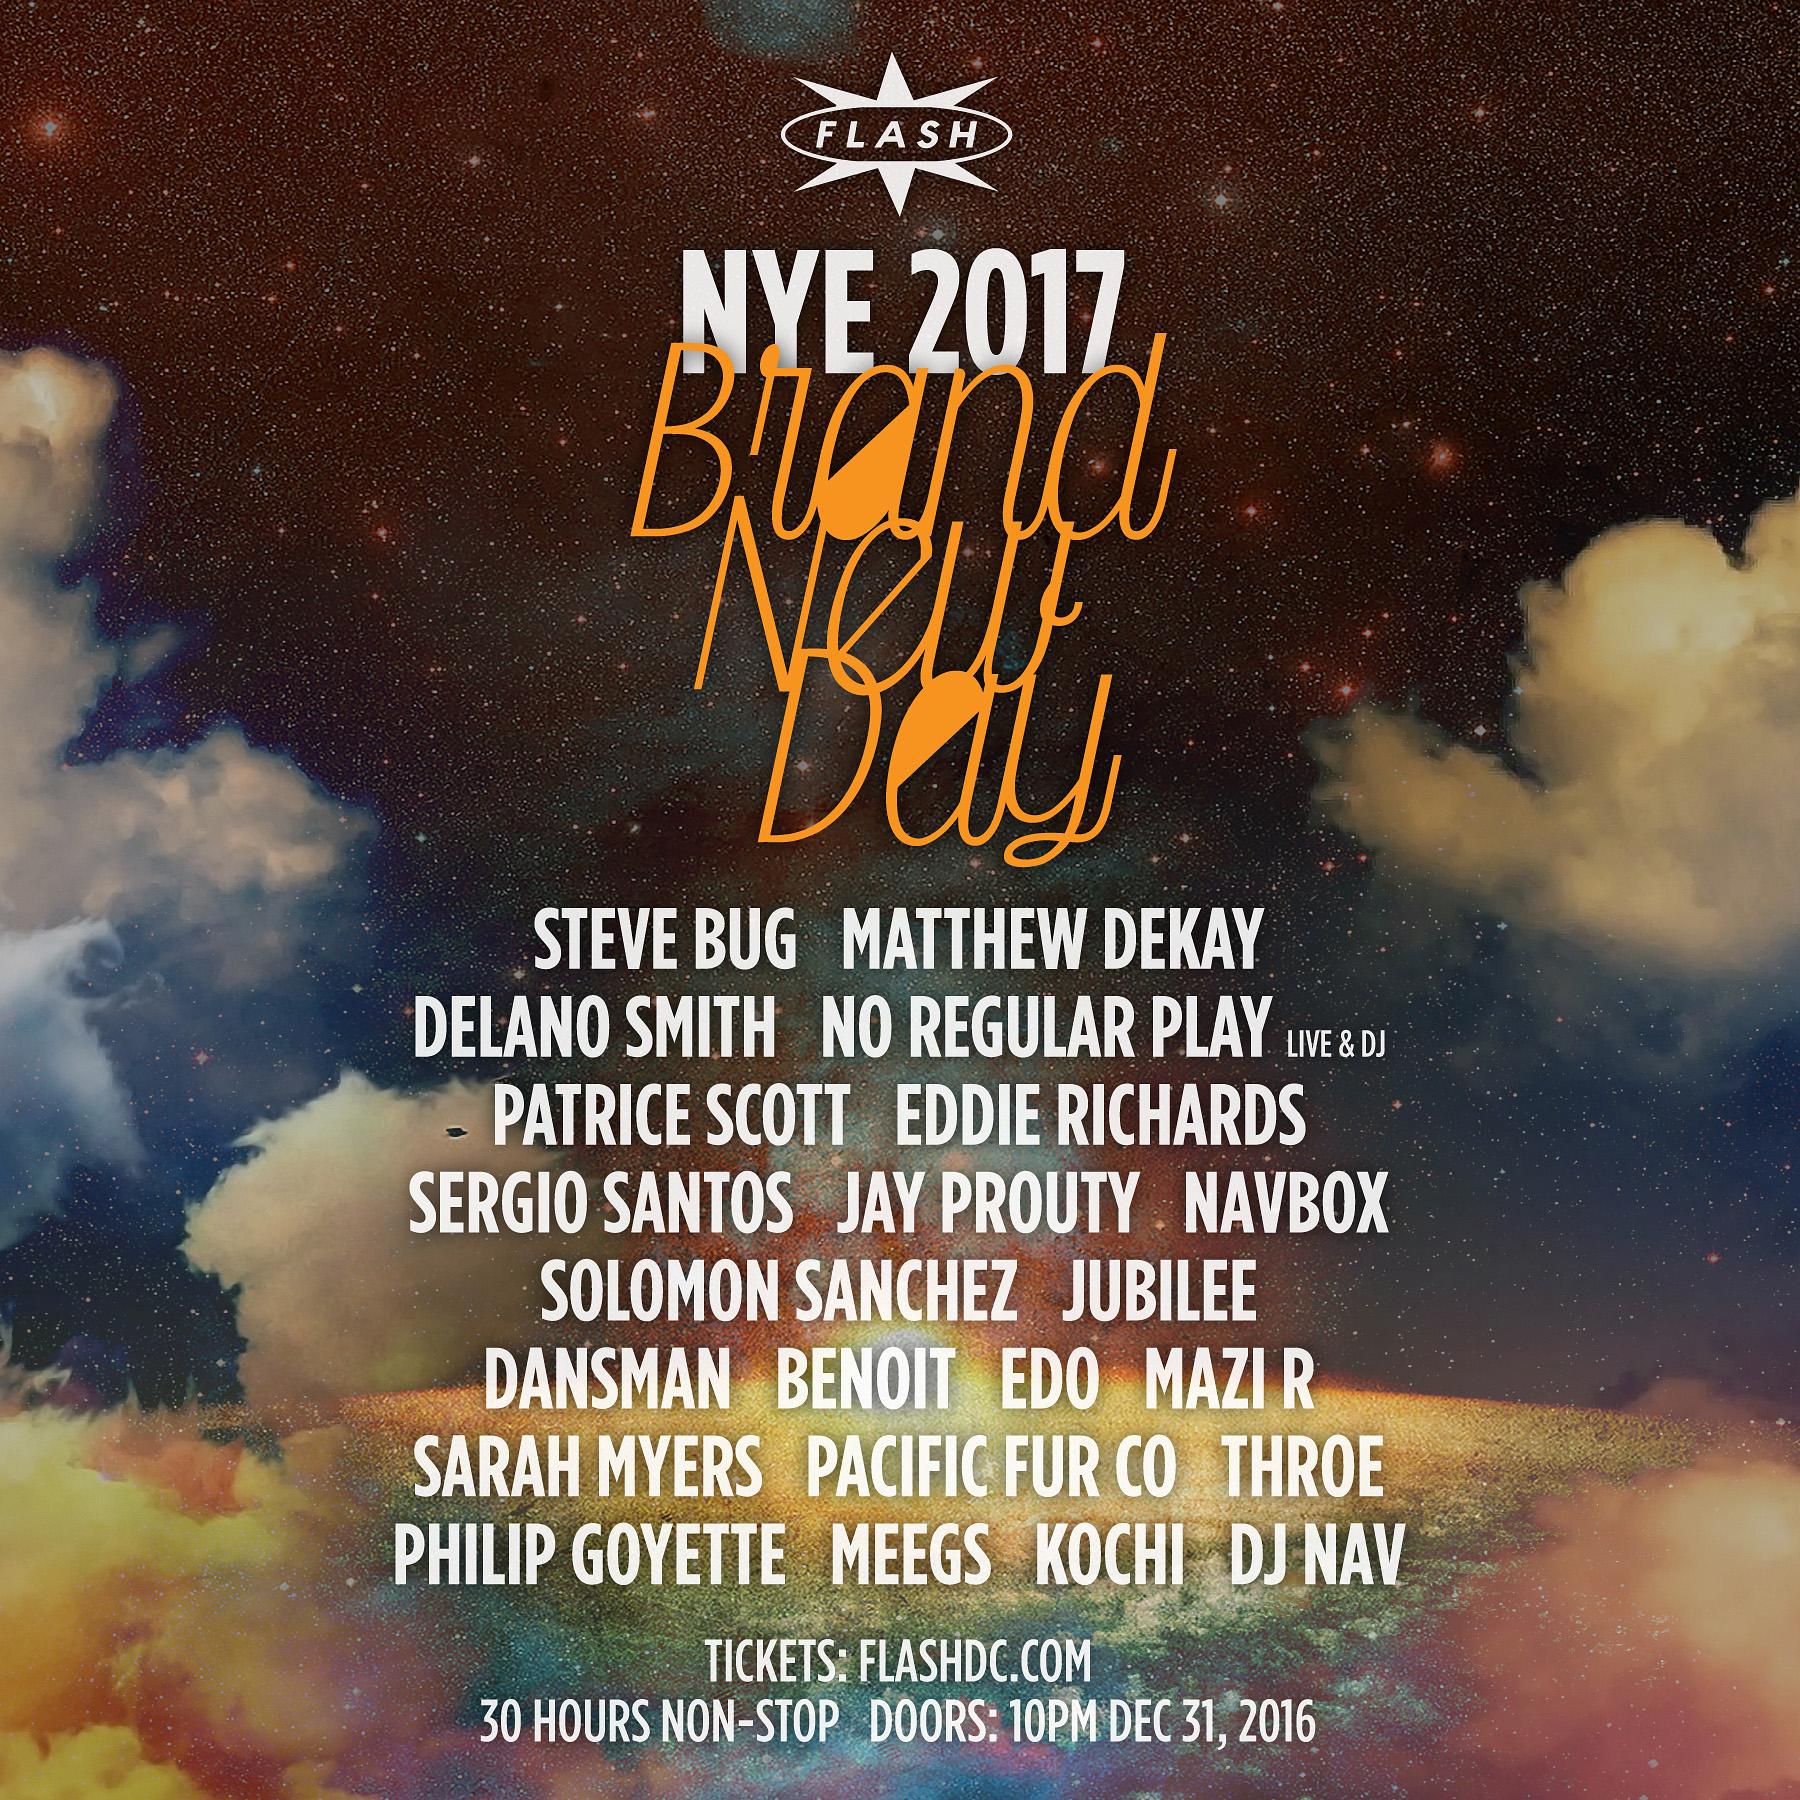 Flash NYE 2017: Brand New Day w/ Steve Bug, Delano Smith + more event thumbnail